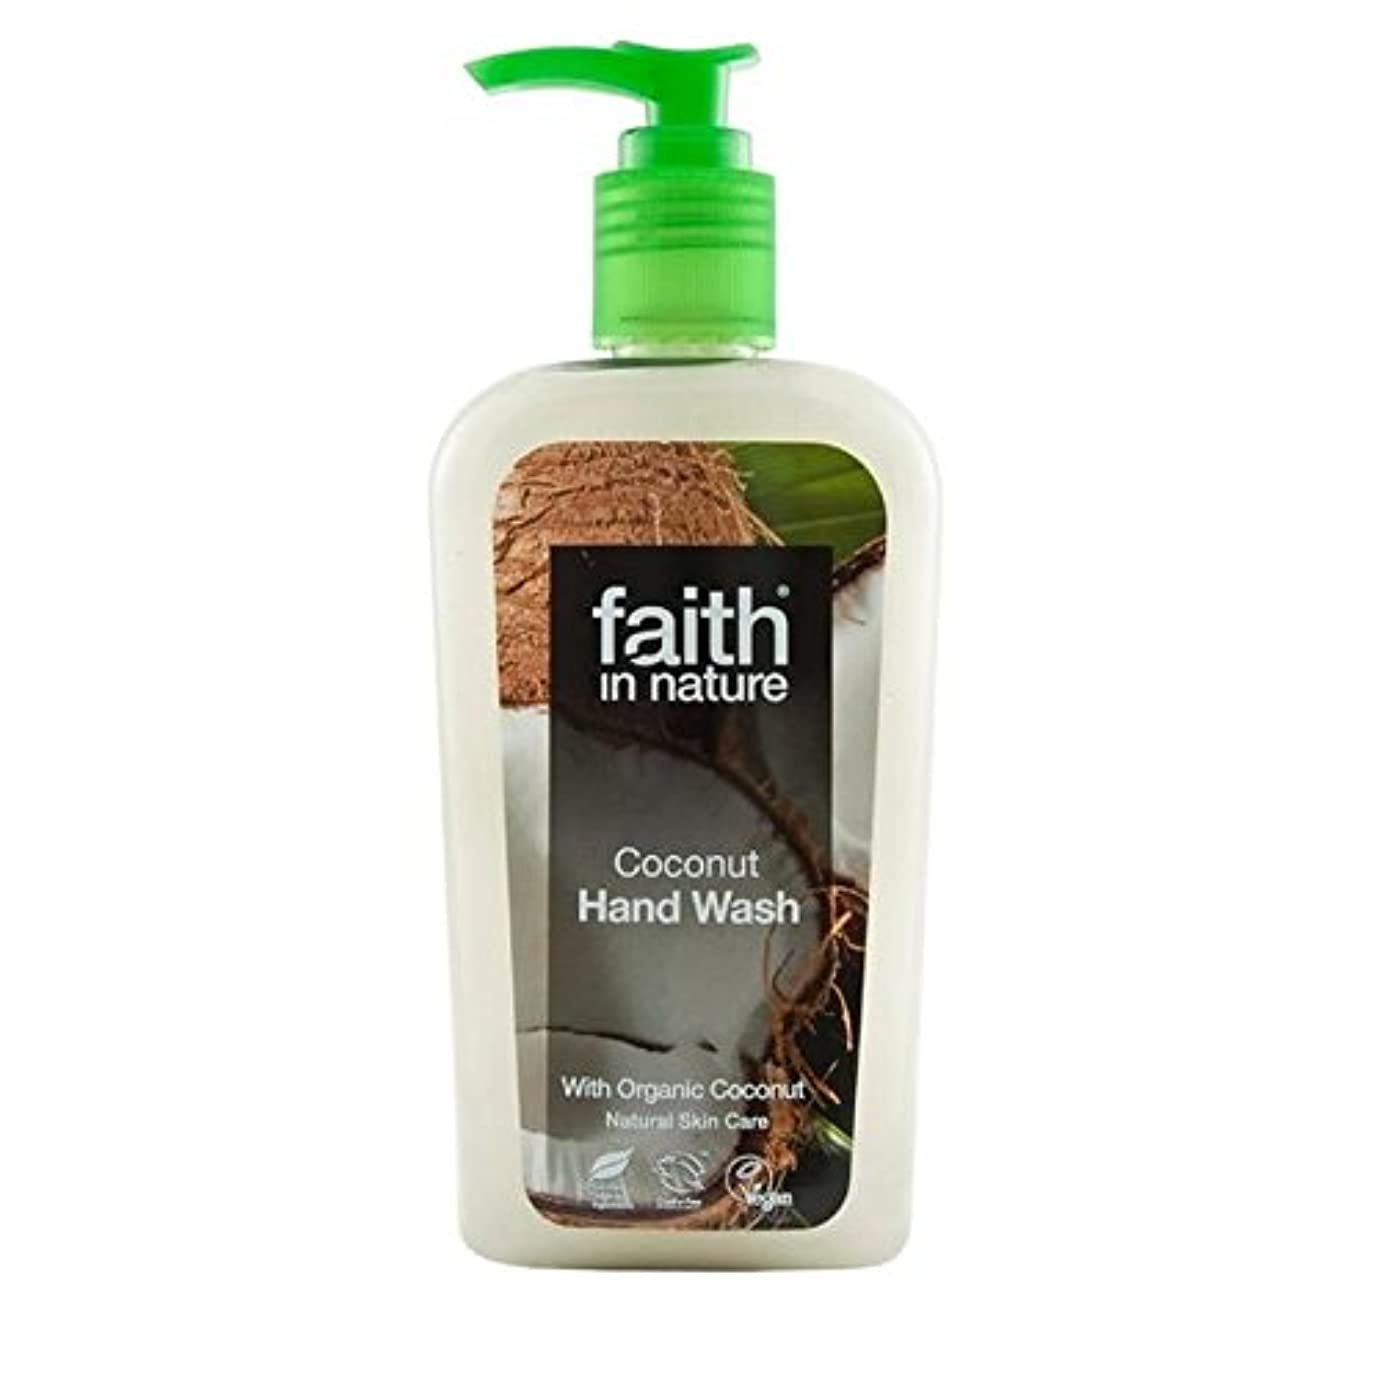 Faith in Nature Coconut Handwash 300ml (Pack of 2) - (Faith In Nature) 自然ココナッツ手洗いの300ミリリットルの信仰 (x2) [並行輸入品]